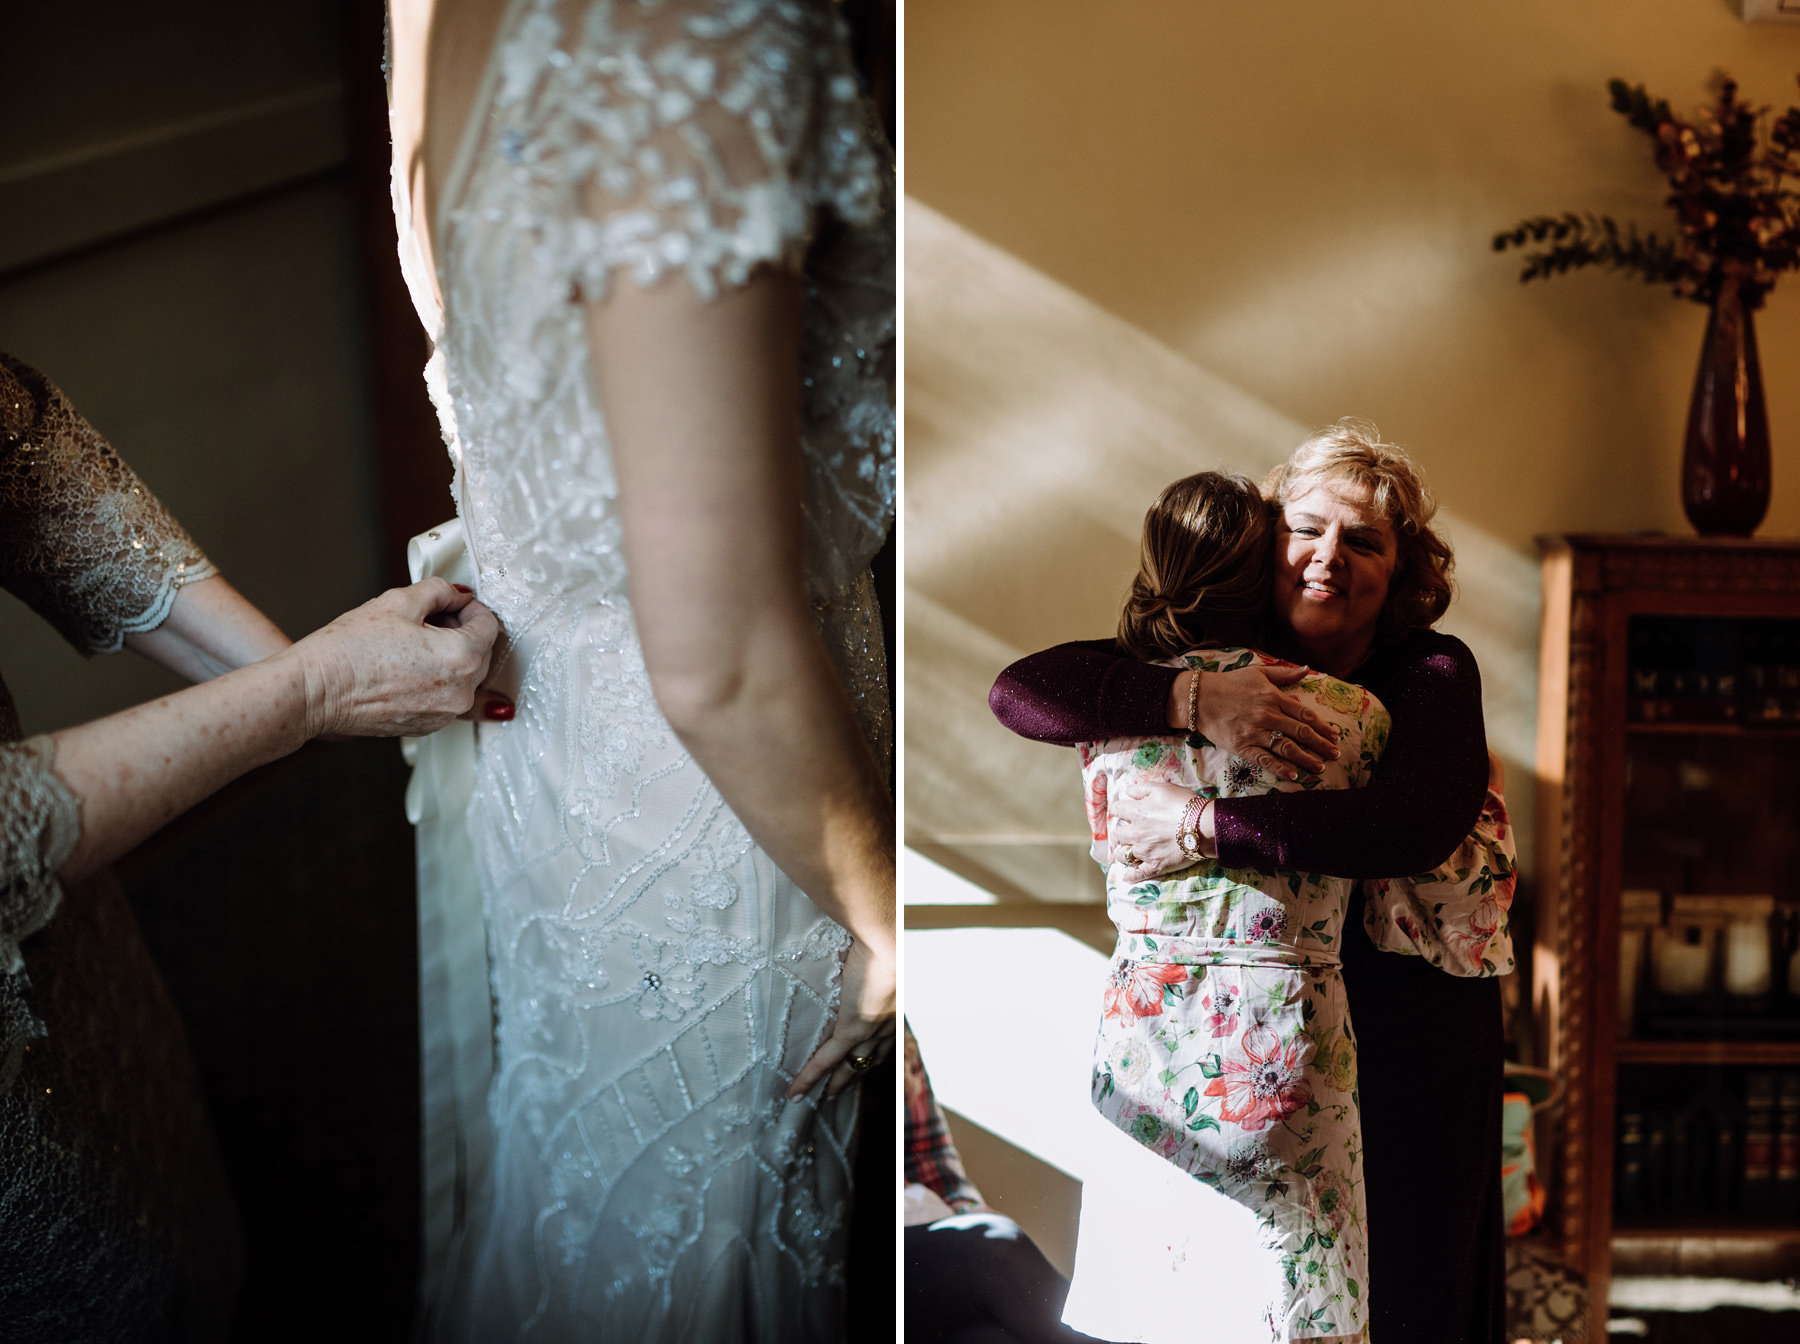 Memorial Presbyterian Wedding in St. Louis Missouri_Kindling Wedding Photography012.JPG